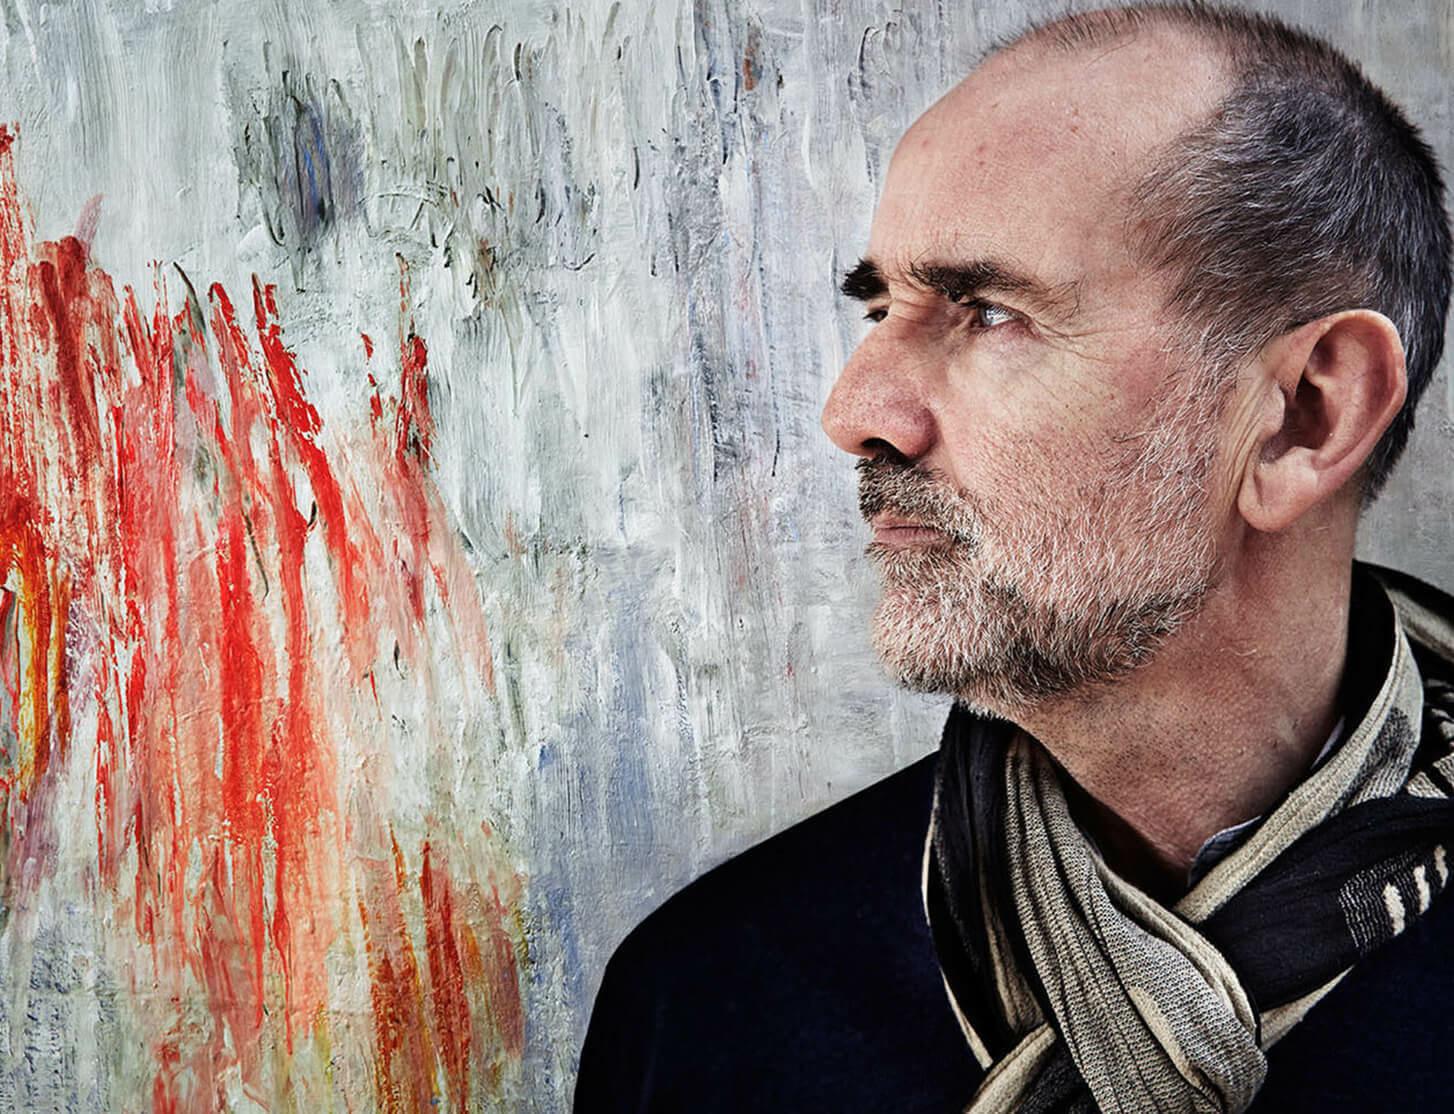 Dialogue Series: Christopher Le Brun and Tim Marlow in conversation at Art Basel Hong Kong